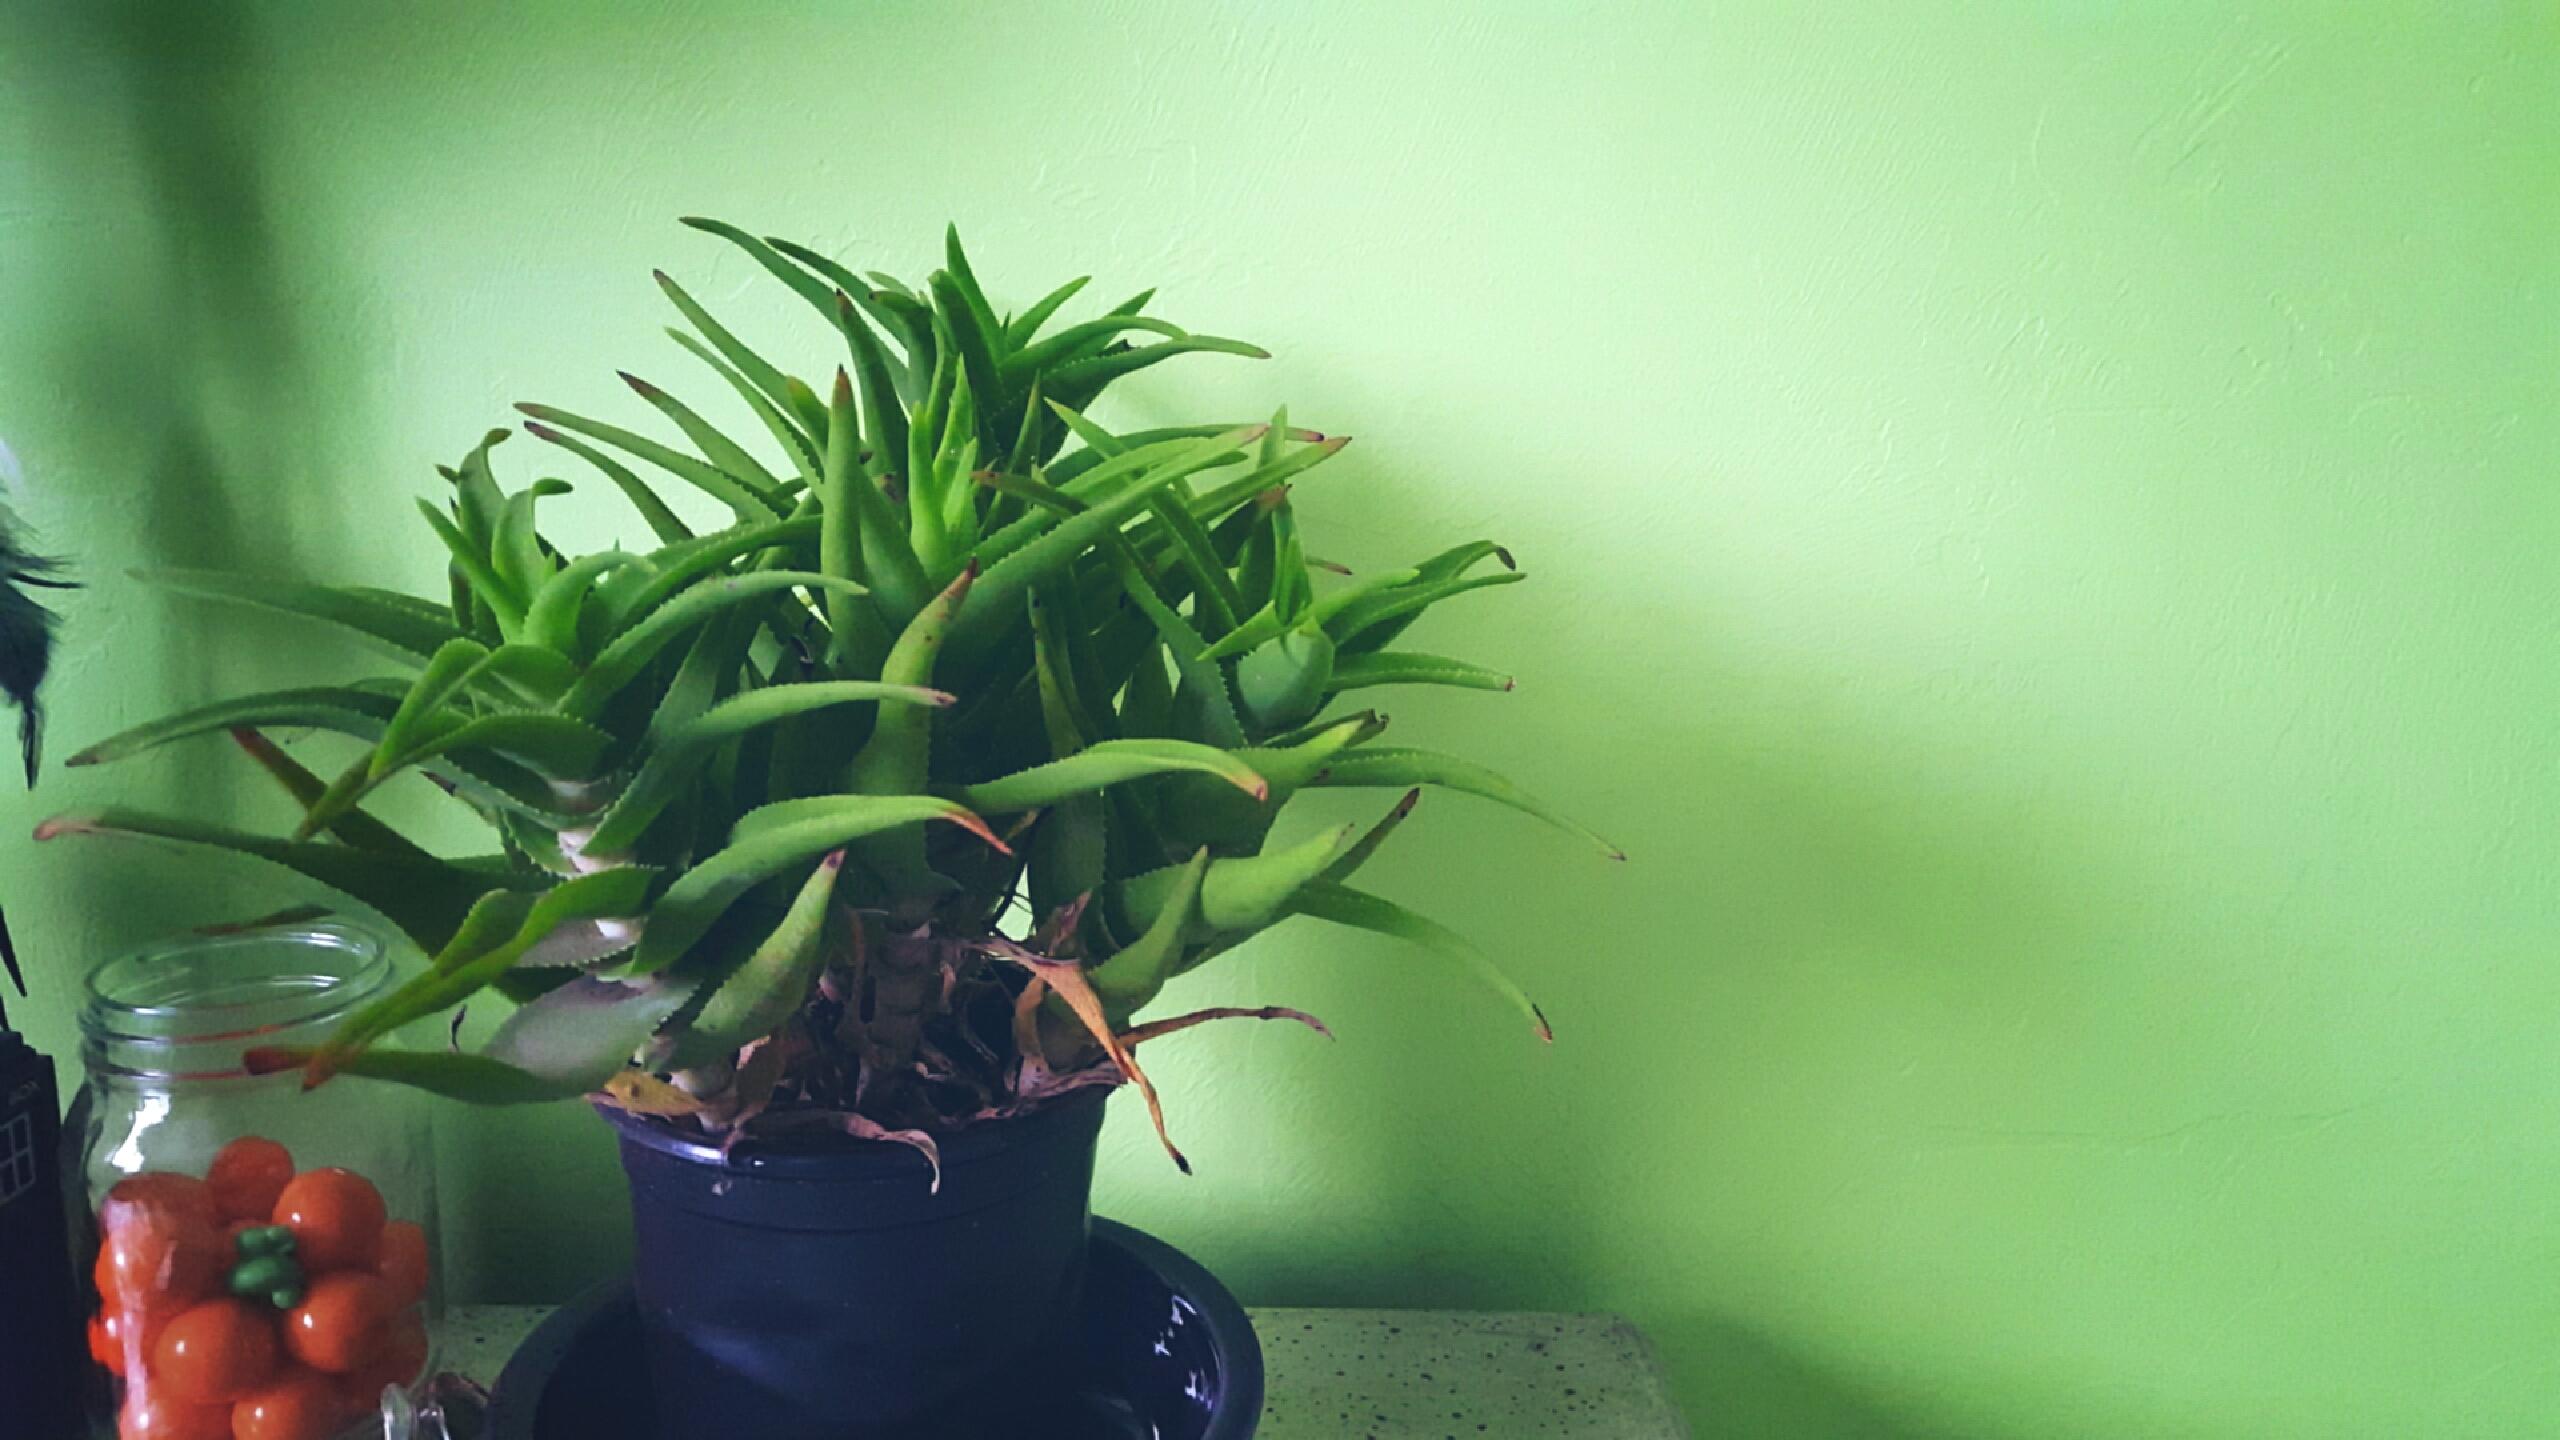 Plant Art Aesthetic Tumblr Image By Jordan Twichie